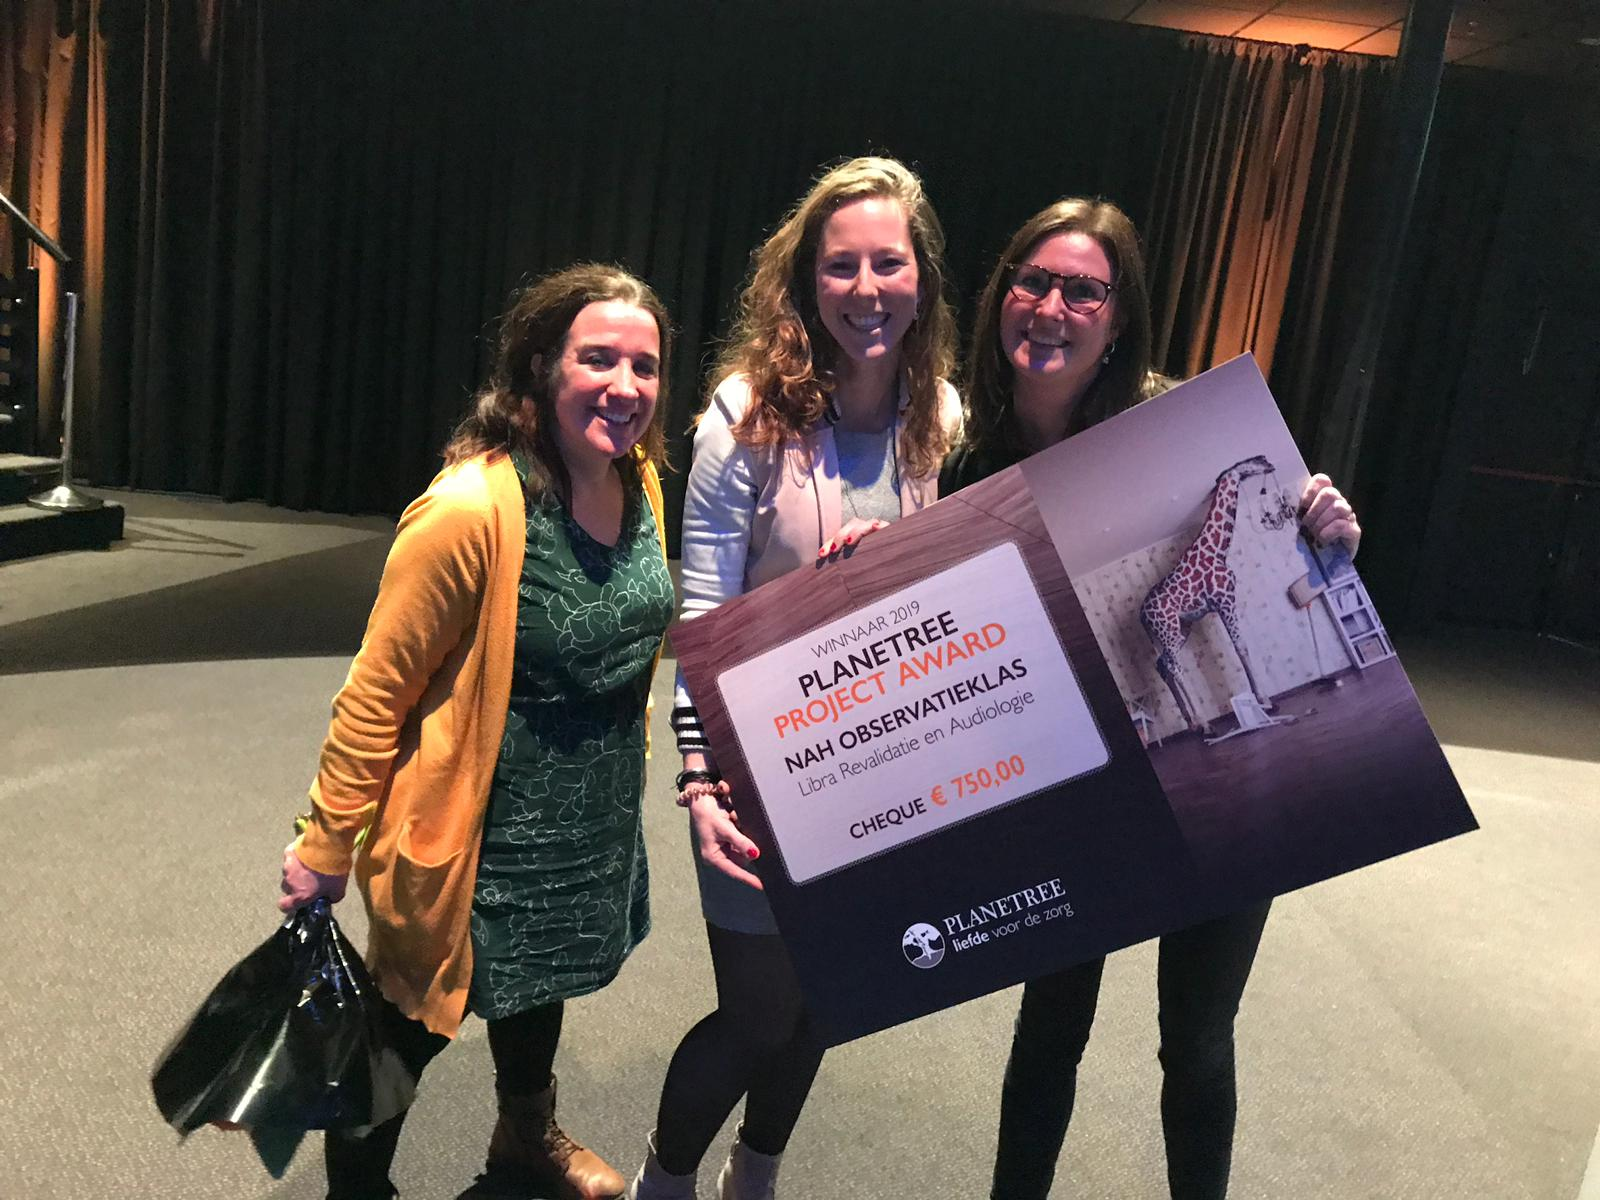 NAH-observatieklas winnaar Planetree Award 2019!